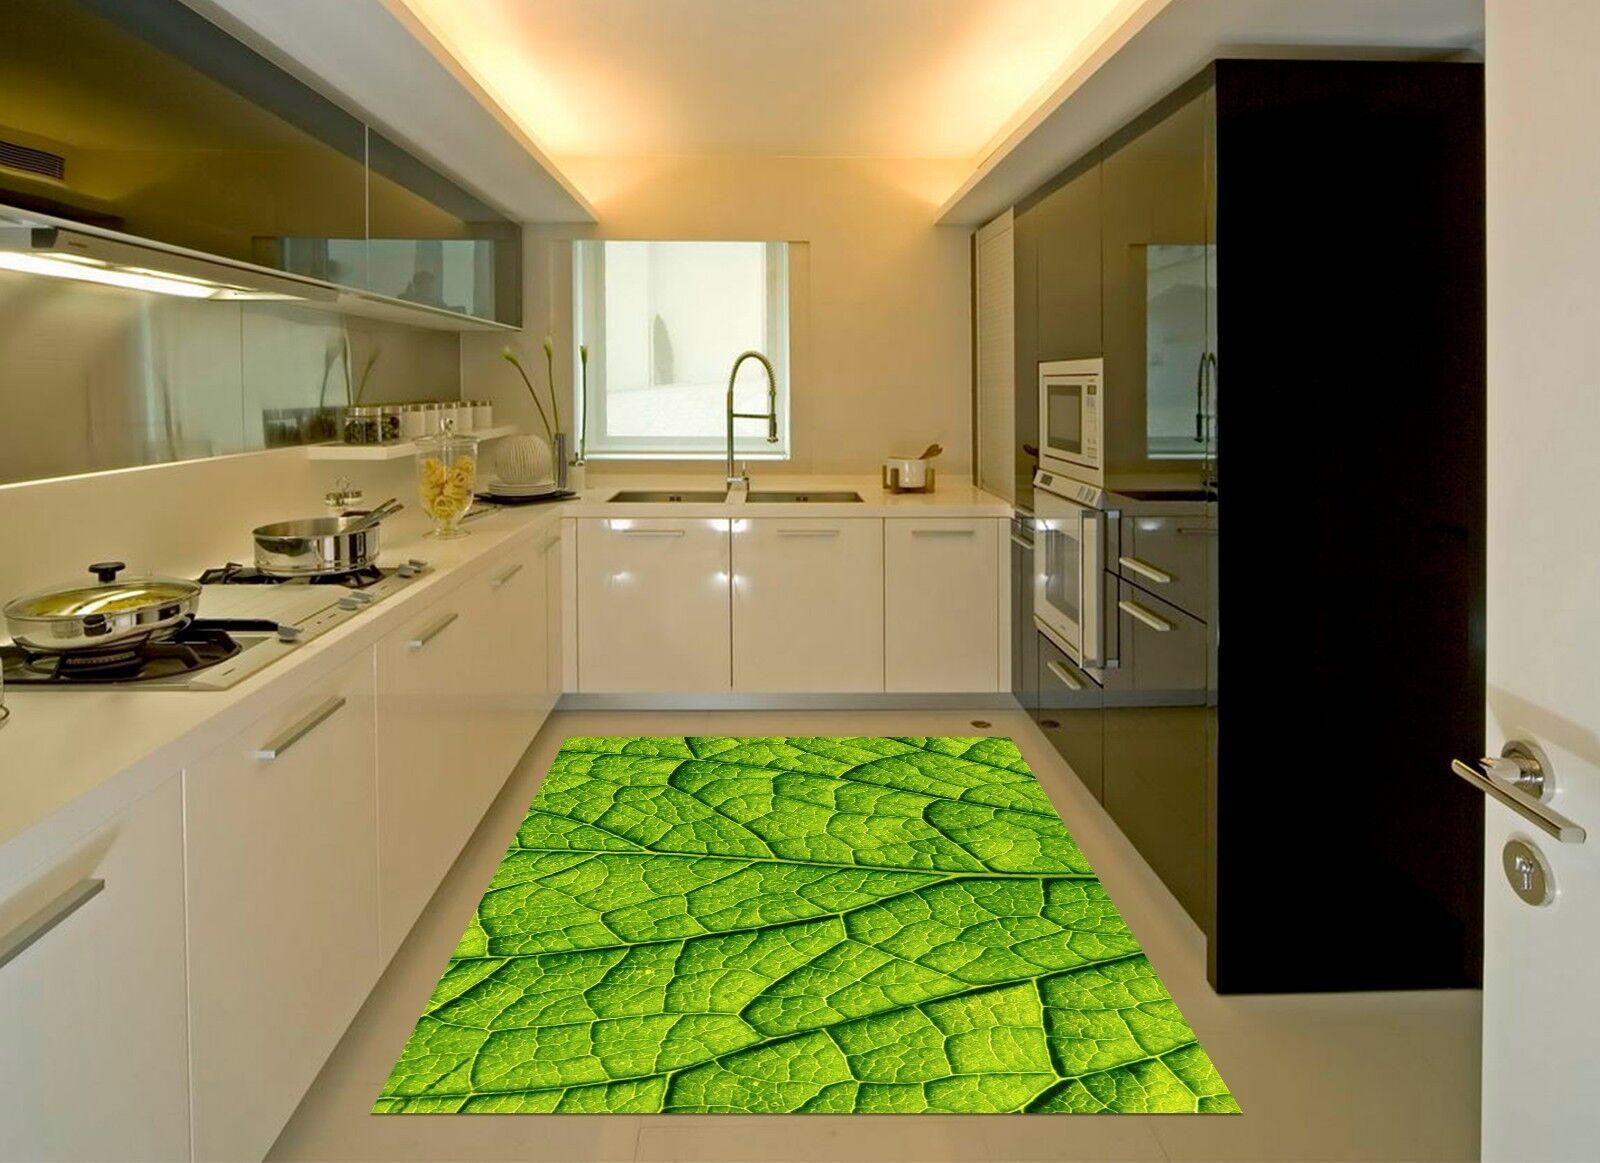 3D Leaf Texture 786 Kitchen Mat Floor Murals Wall Print Wall Deco UK Carly